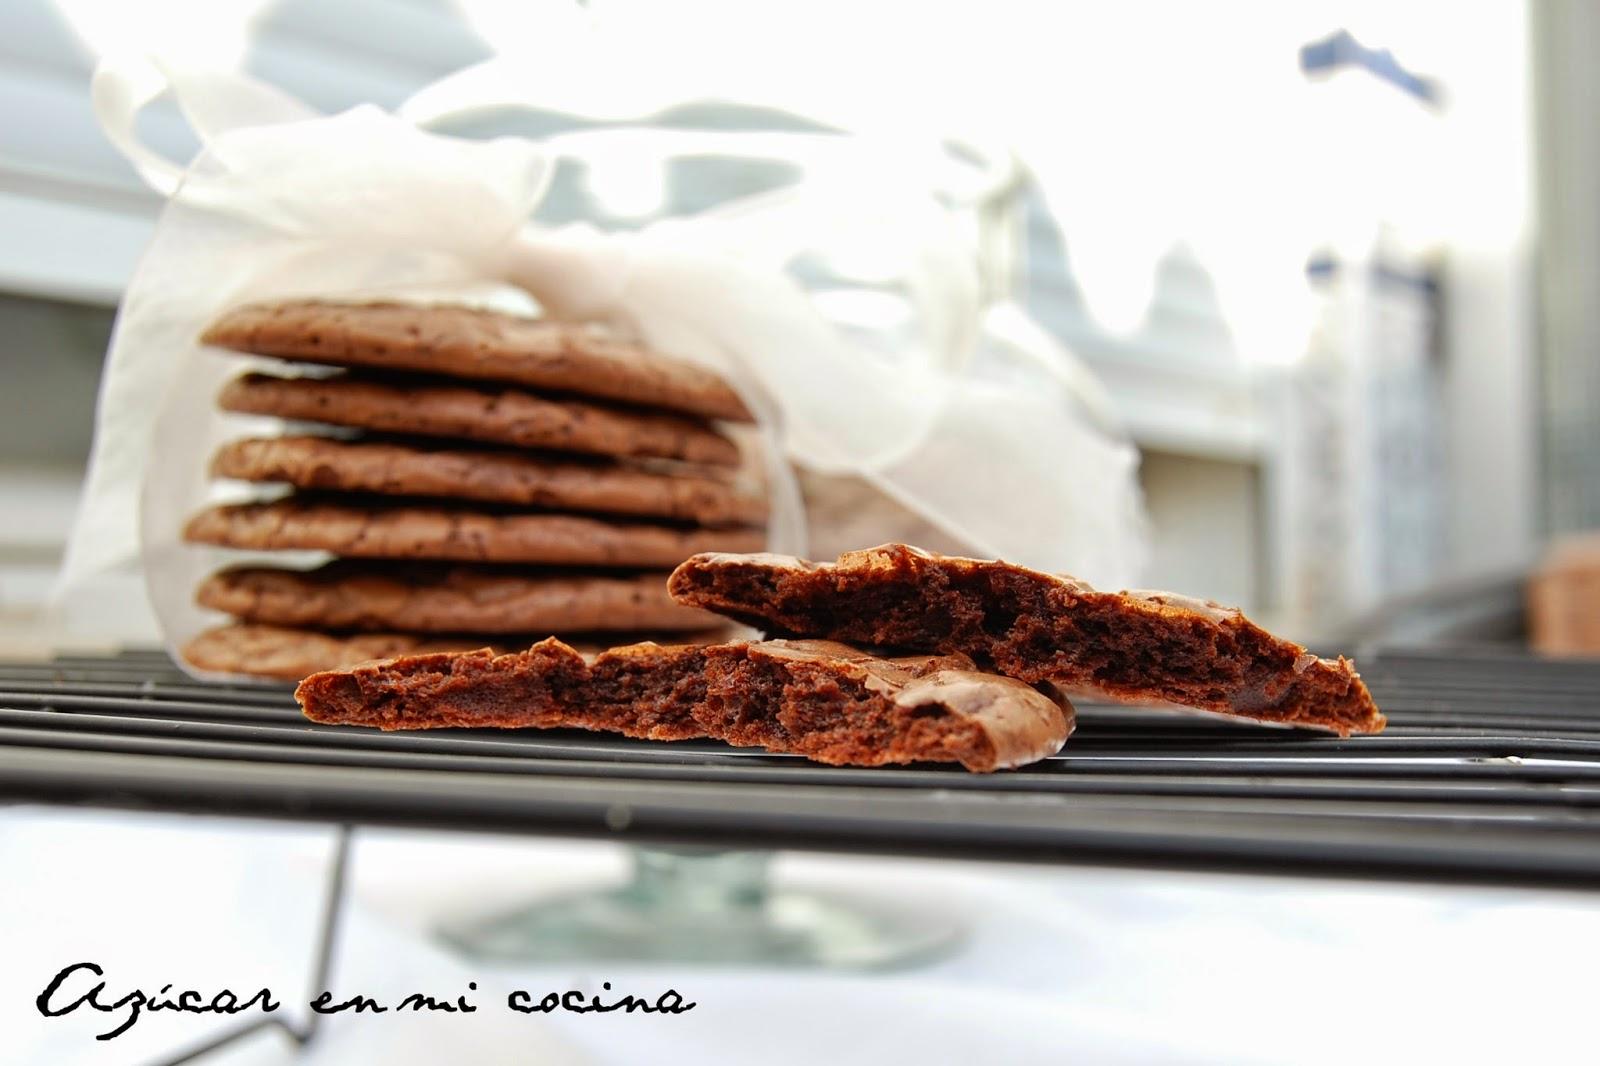 http://azucarenmicocina.blogspot.com.es/2014/04/galletas-brownie.html